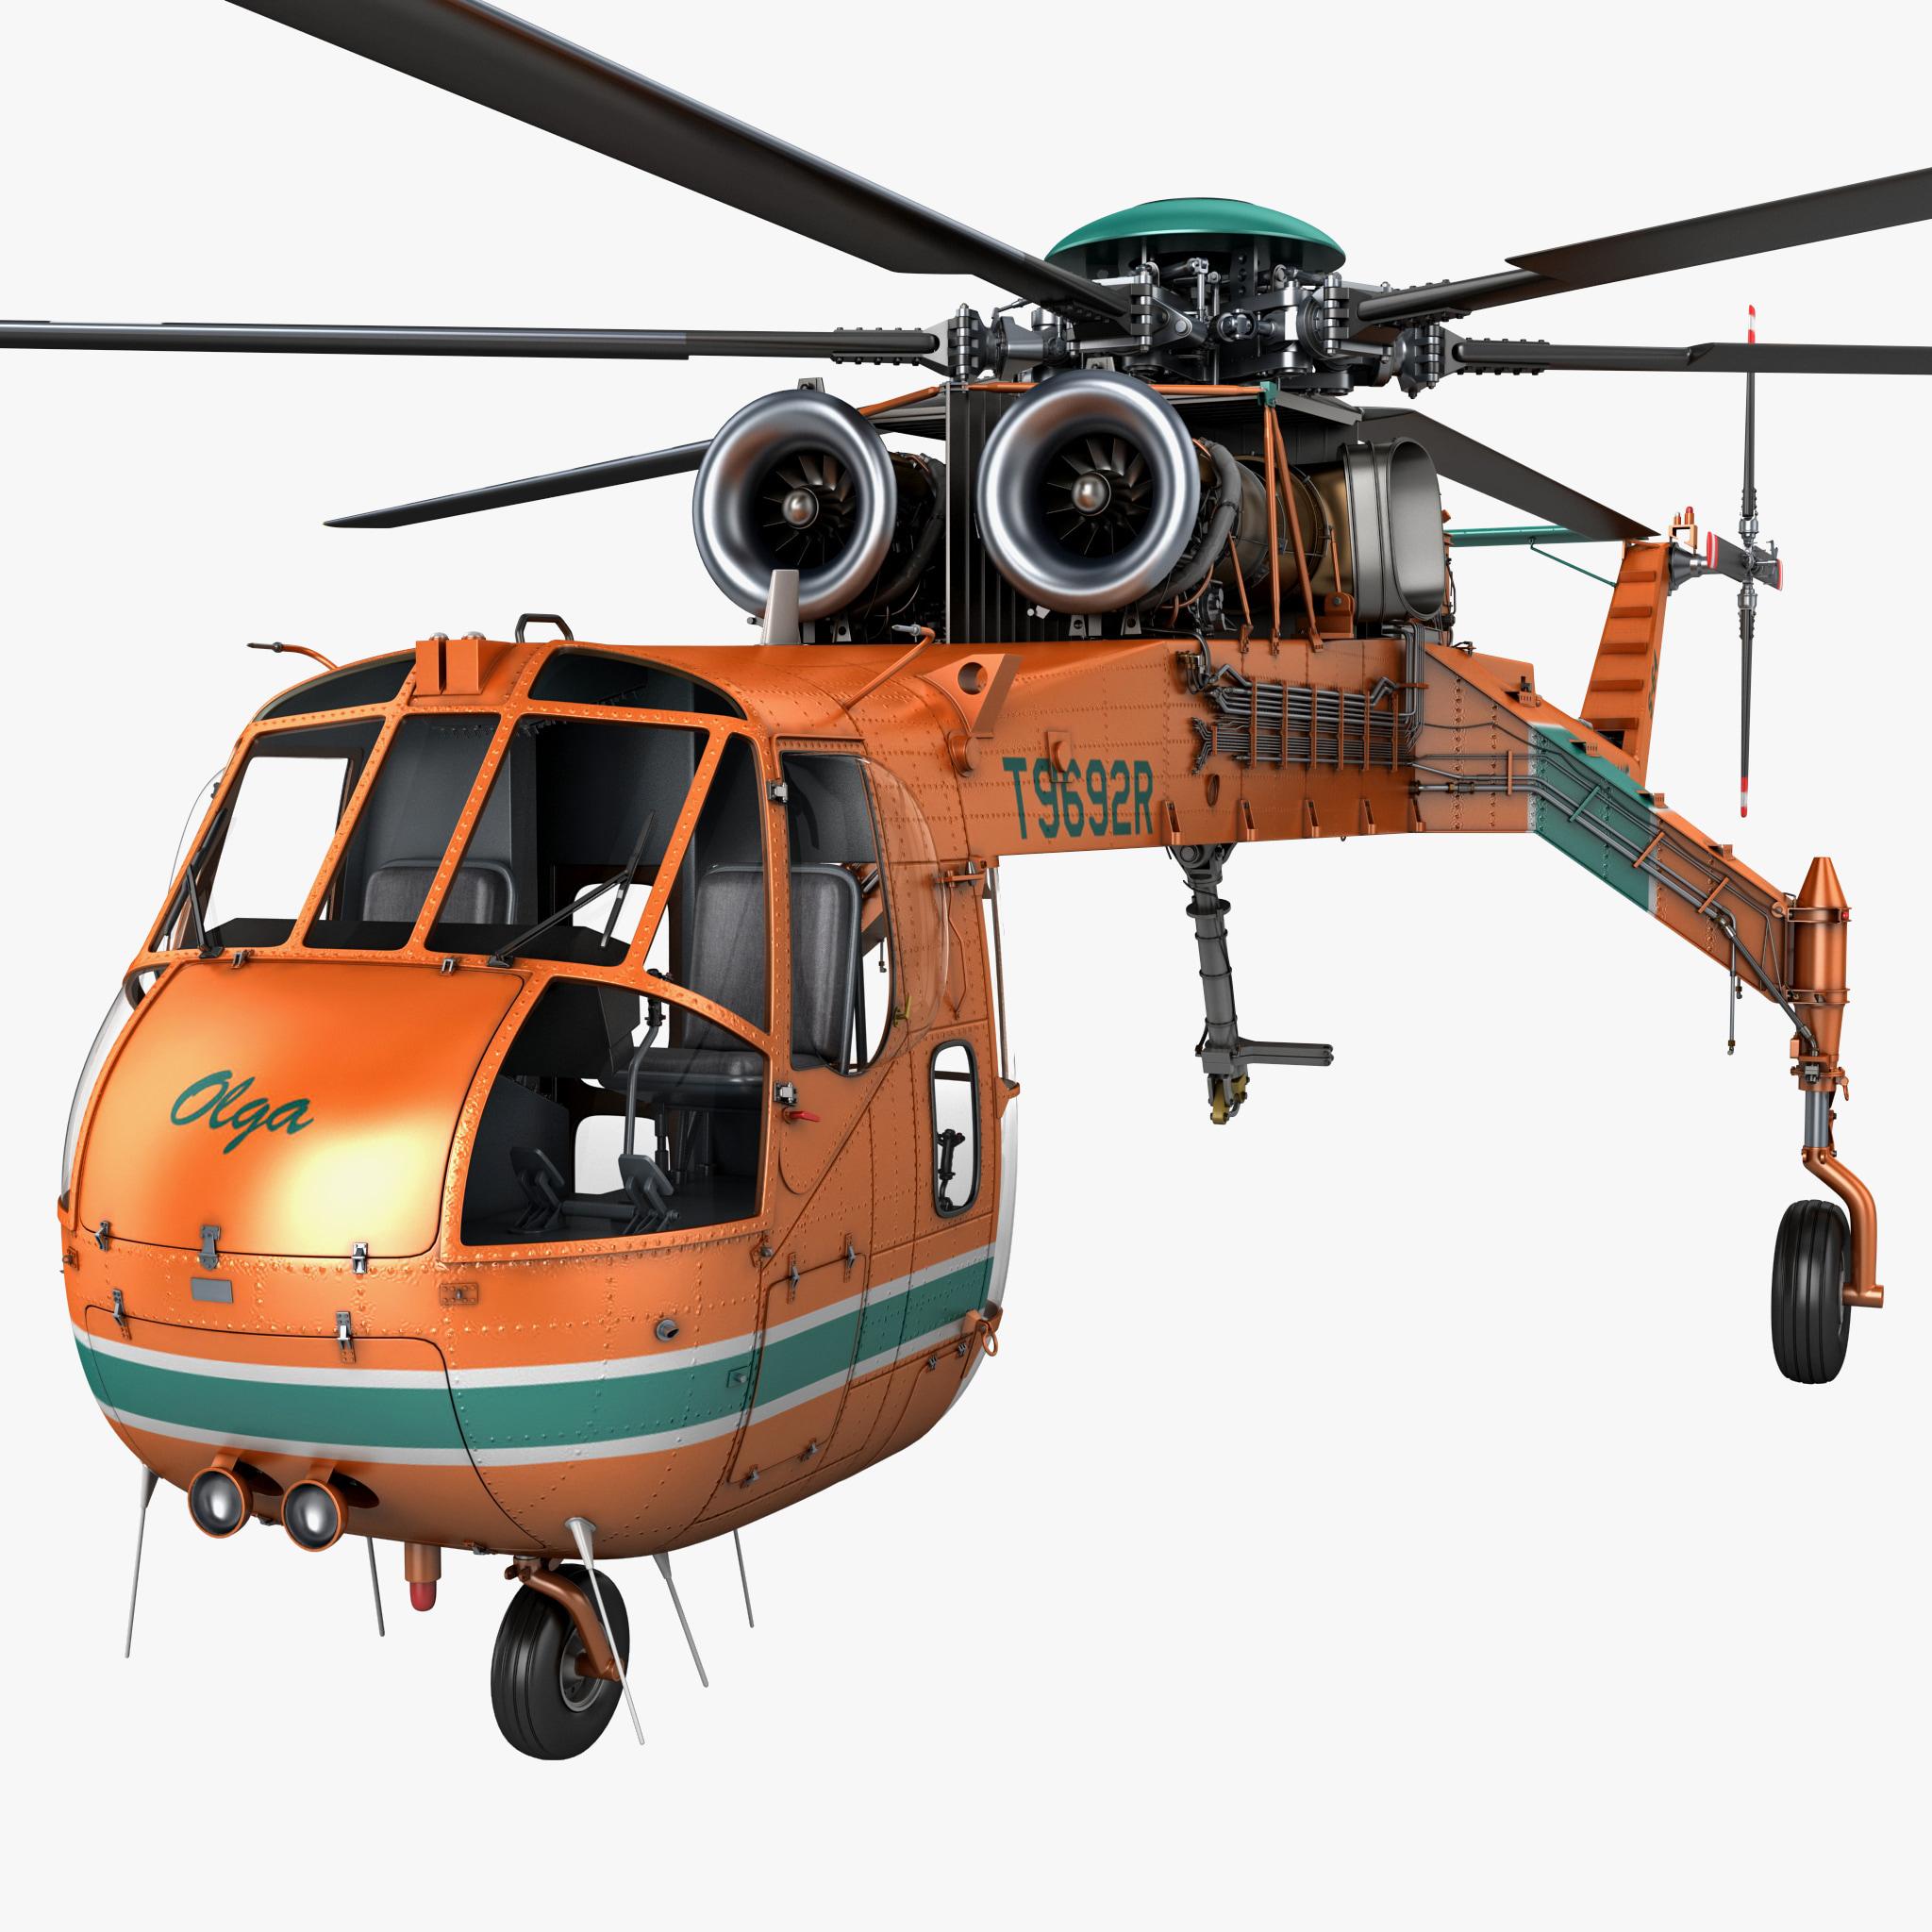 Sikorsky S-64 Skycrane Helicopter_1.jpg